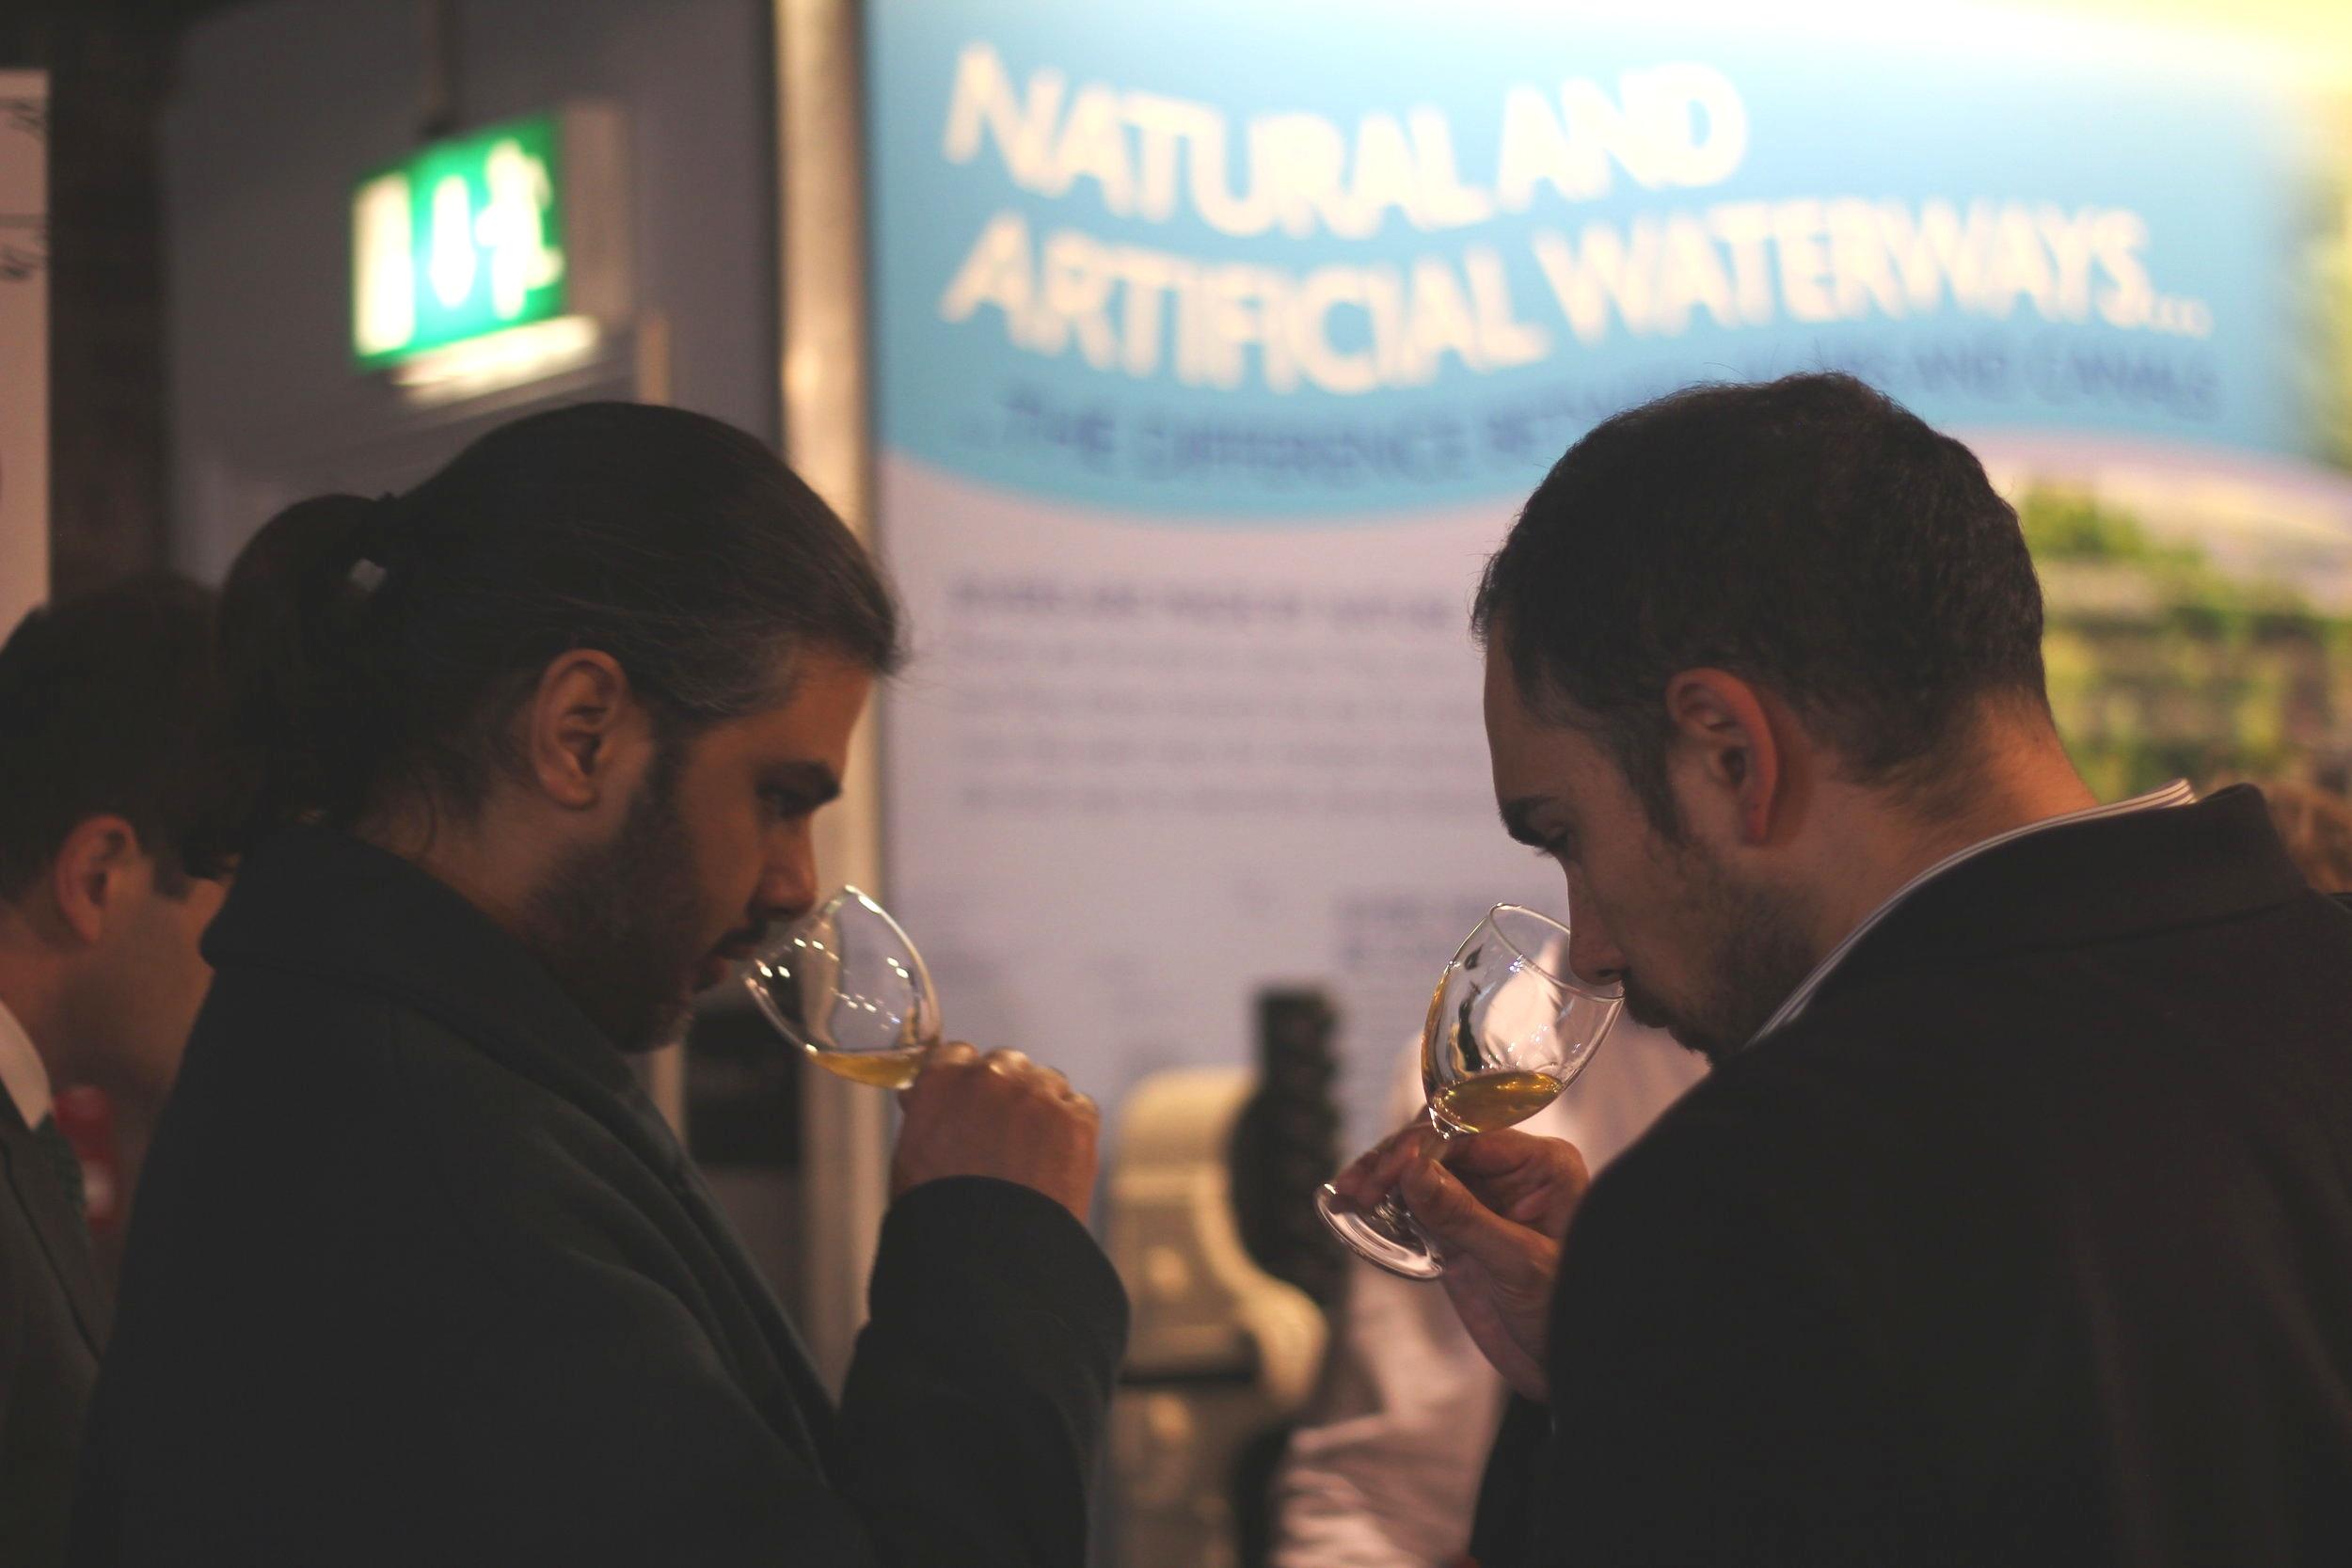 Two gentlemen tasting and smelling Georgian amber or orange wine in the UK